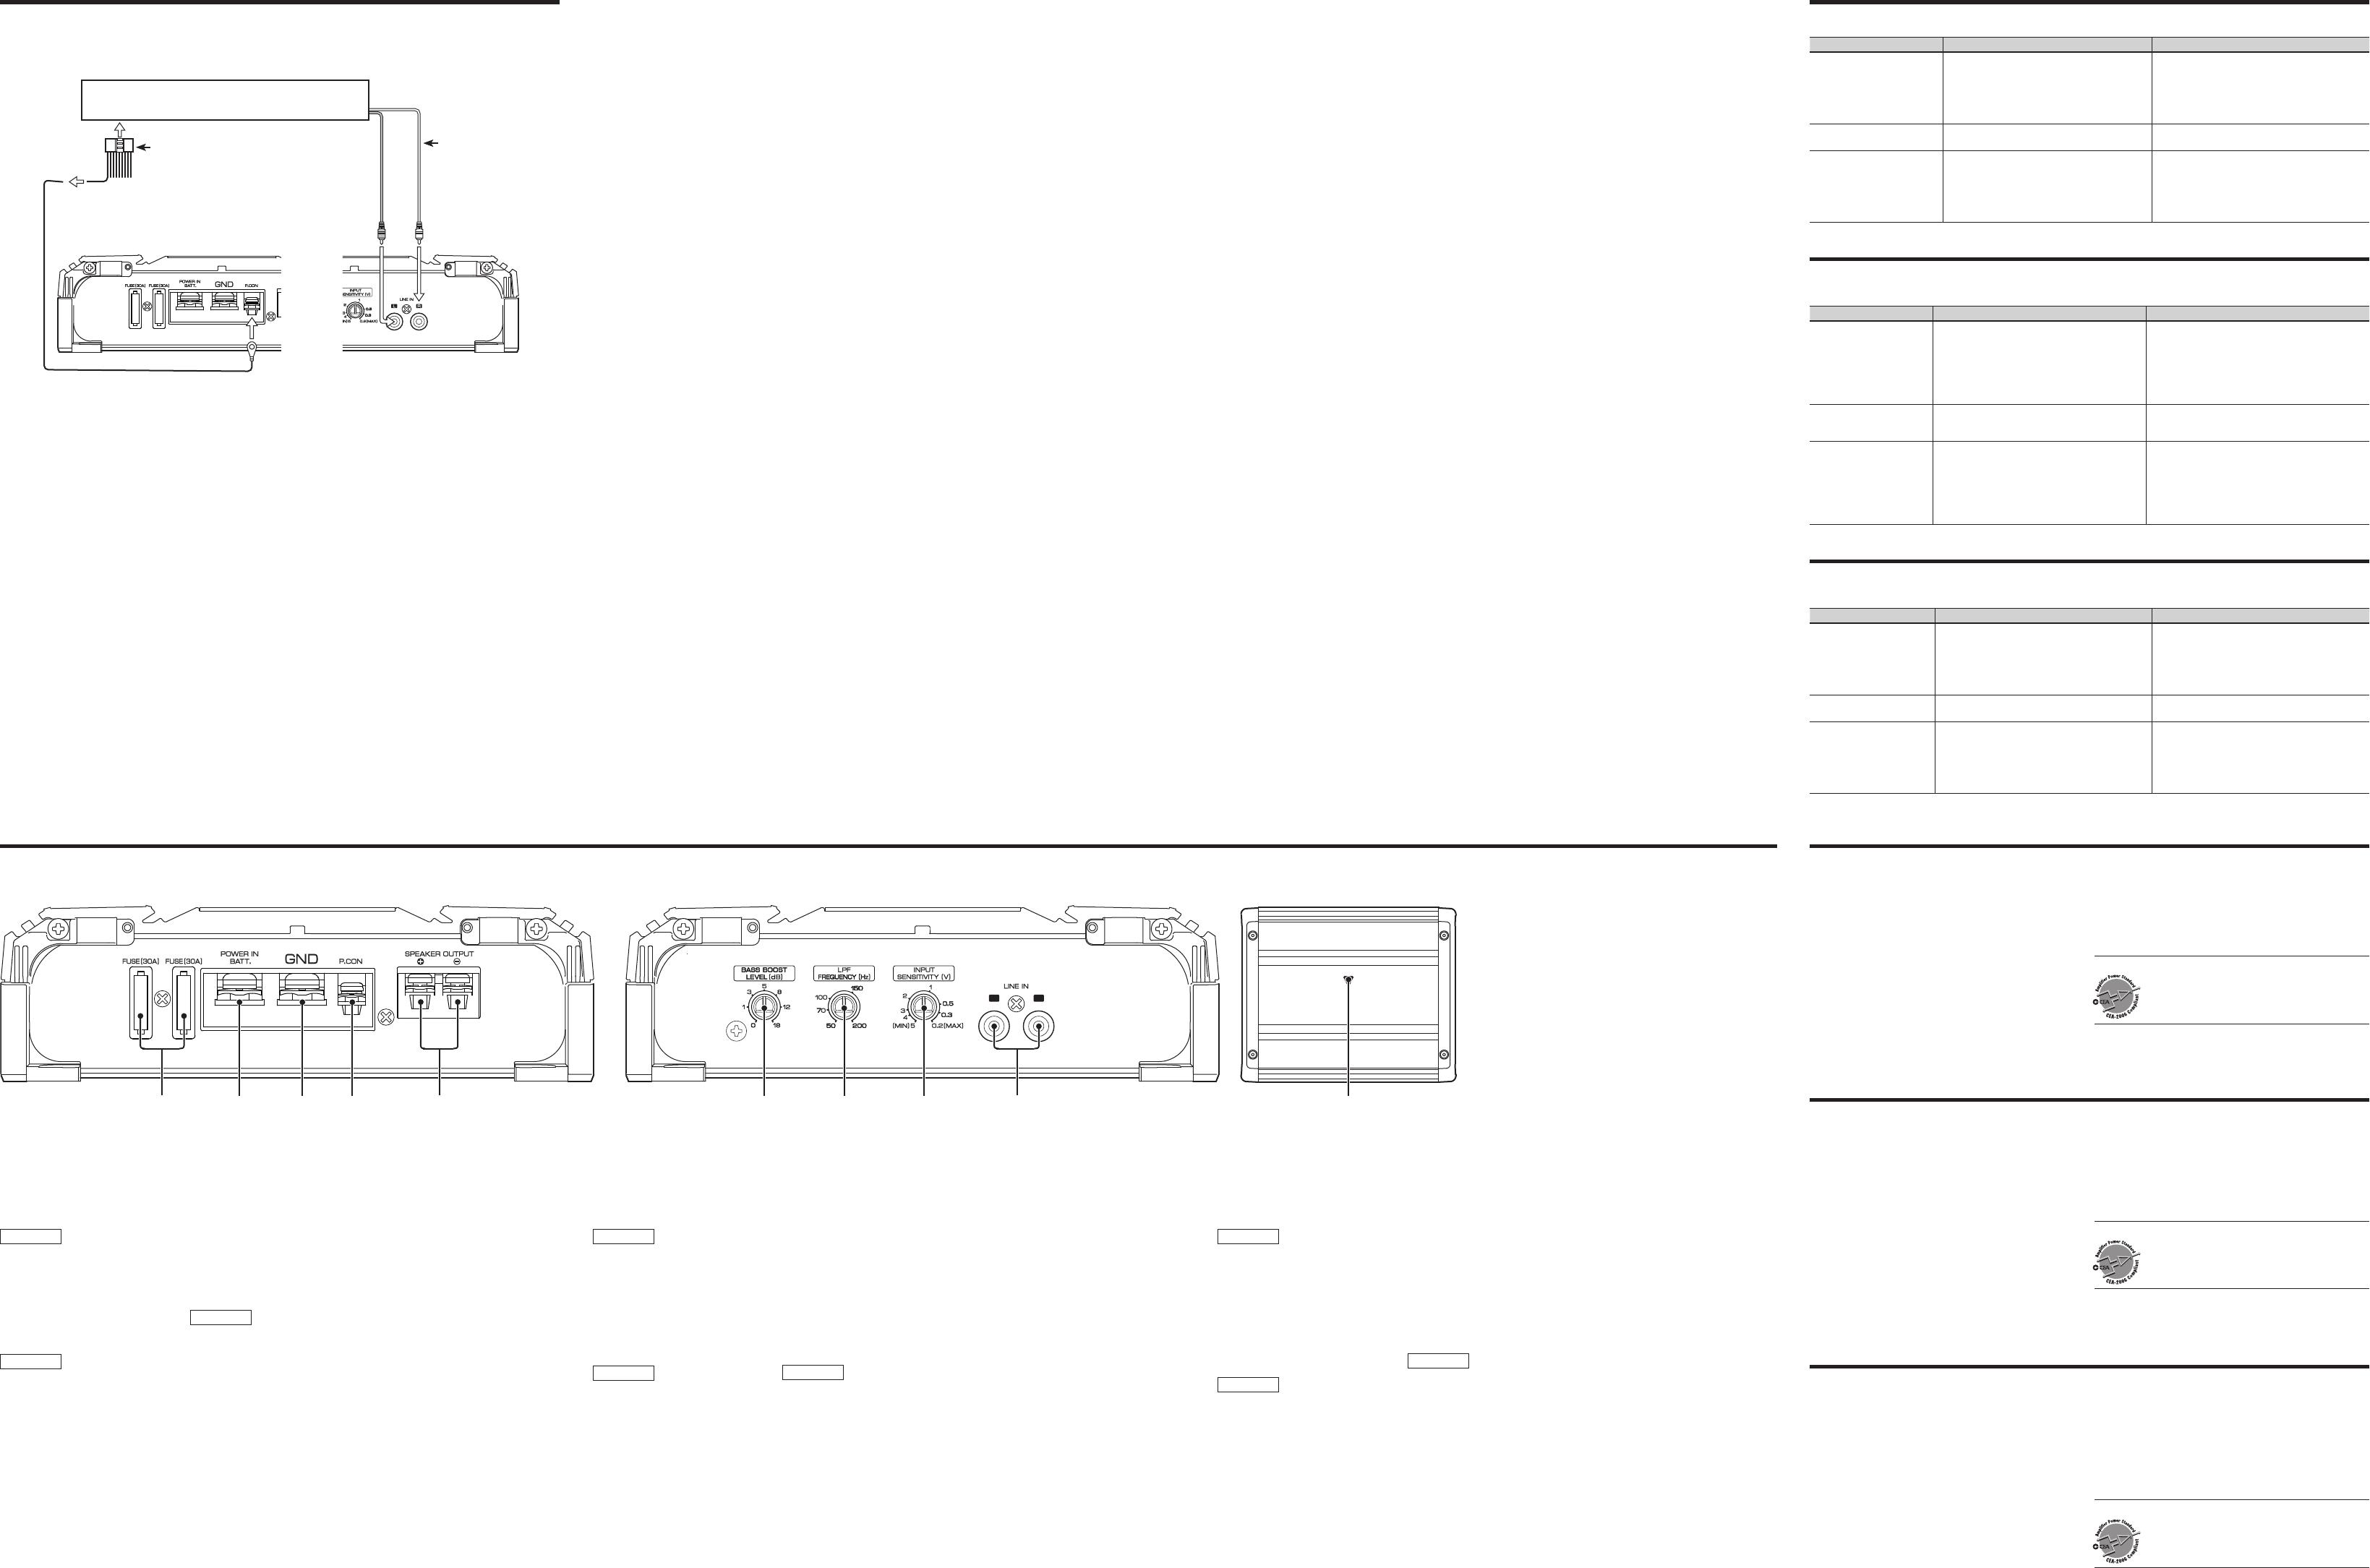 Kenwood X500 1 X500_K_EnFrEs User Manual To The 681d82f9 ... on kenwood speaker diagram, smps power supply circuit diagram, surround sound systems circuit diagram, 2007 silverado 2500hd battery diagram, kenwood kdc, kenwood stereo wiring, kenwood deck wiring-diagram, fuse box diagram, pioneer car stereo wiring diagram, kenwood bt900 wiring-diagram, kenwood harness pinout, kdc stereo harness pinout diagram, kenwood ddx512 wiring-diagram, audio amplifier circuit diagram, kenwood stereo pinout diagram,